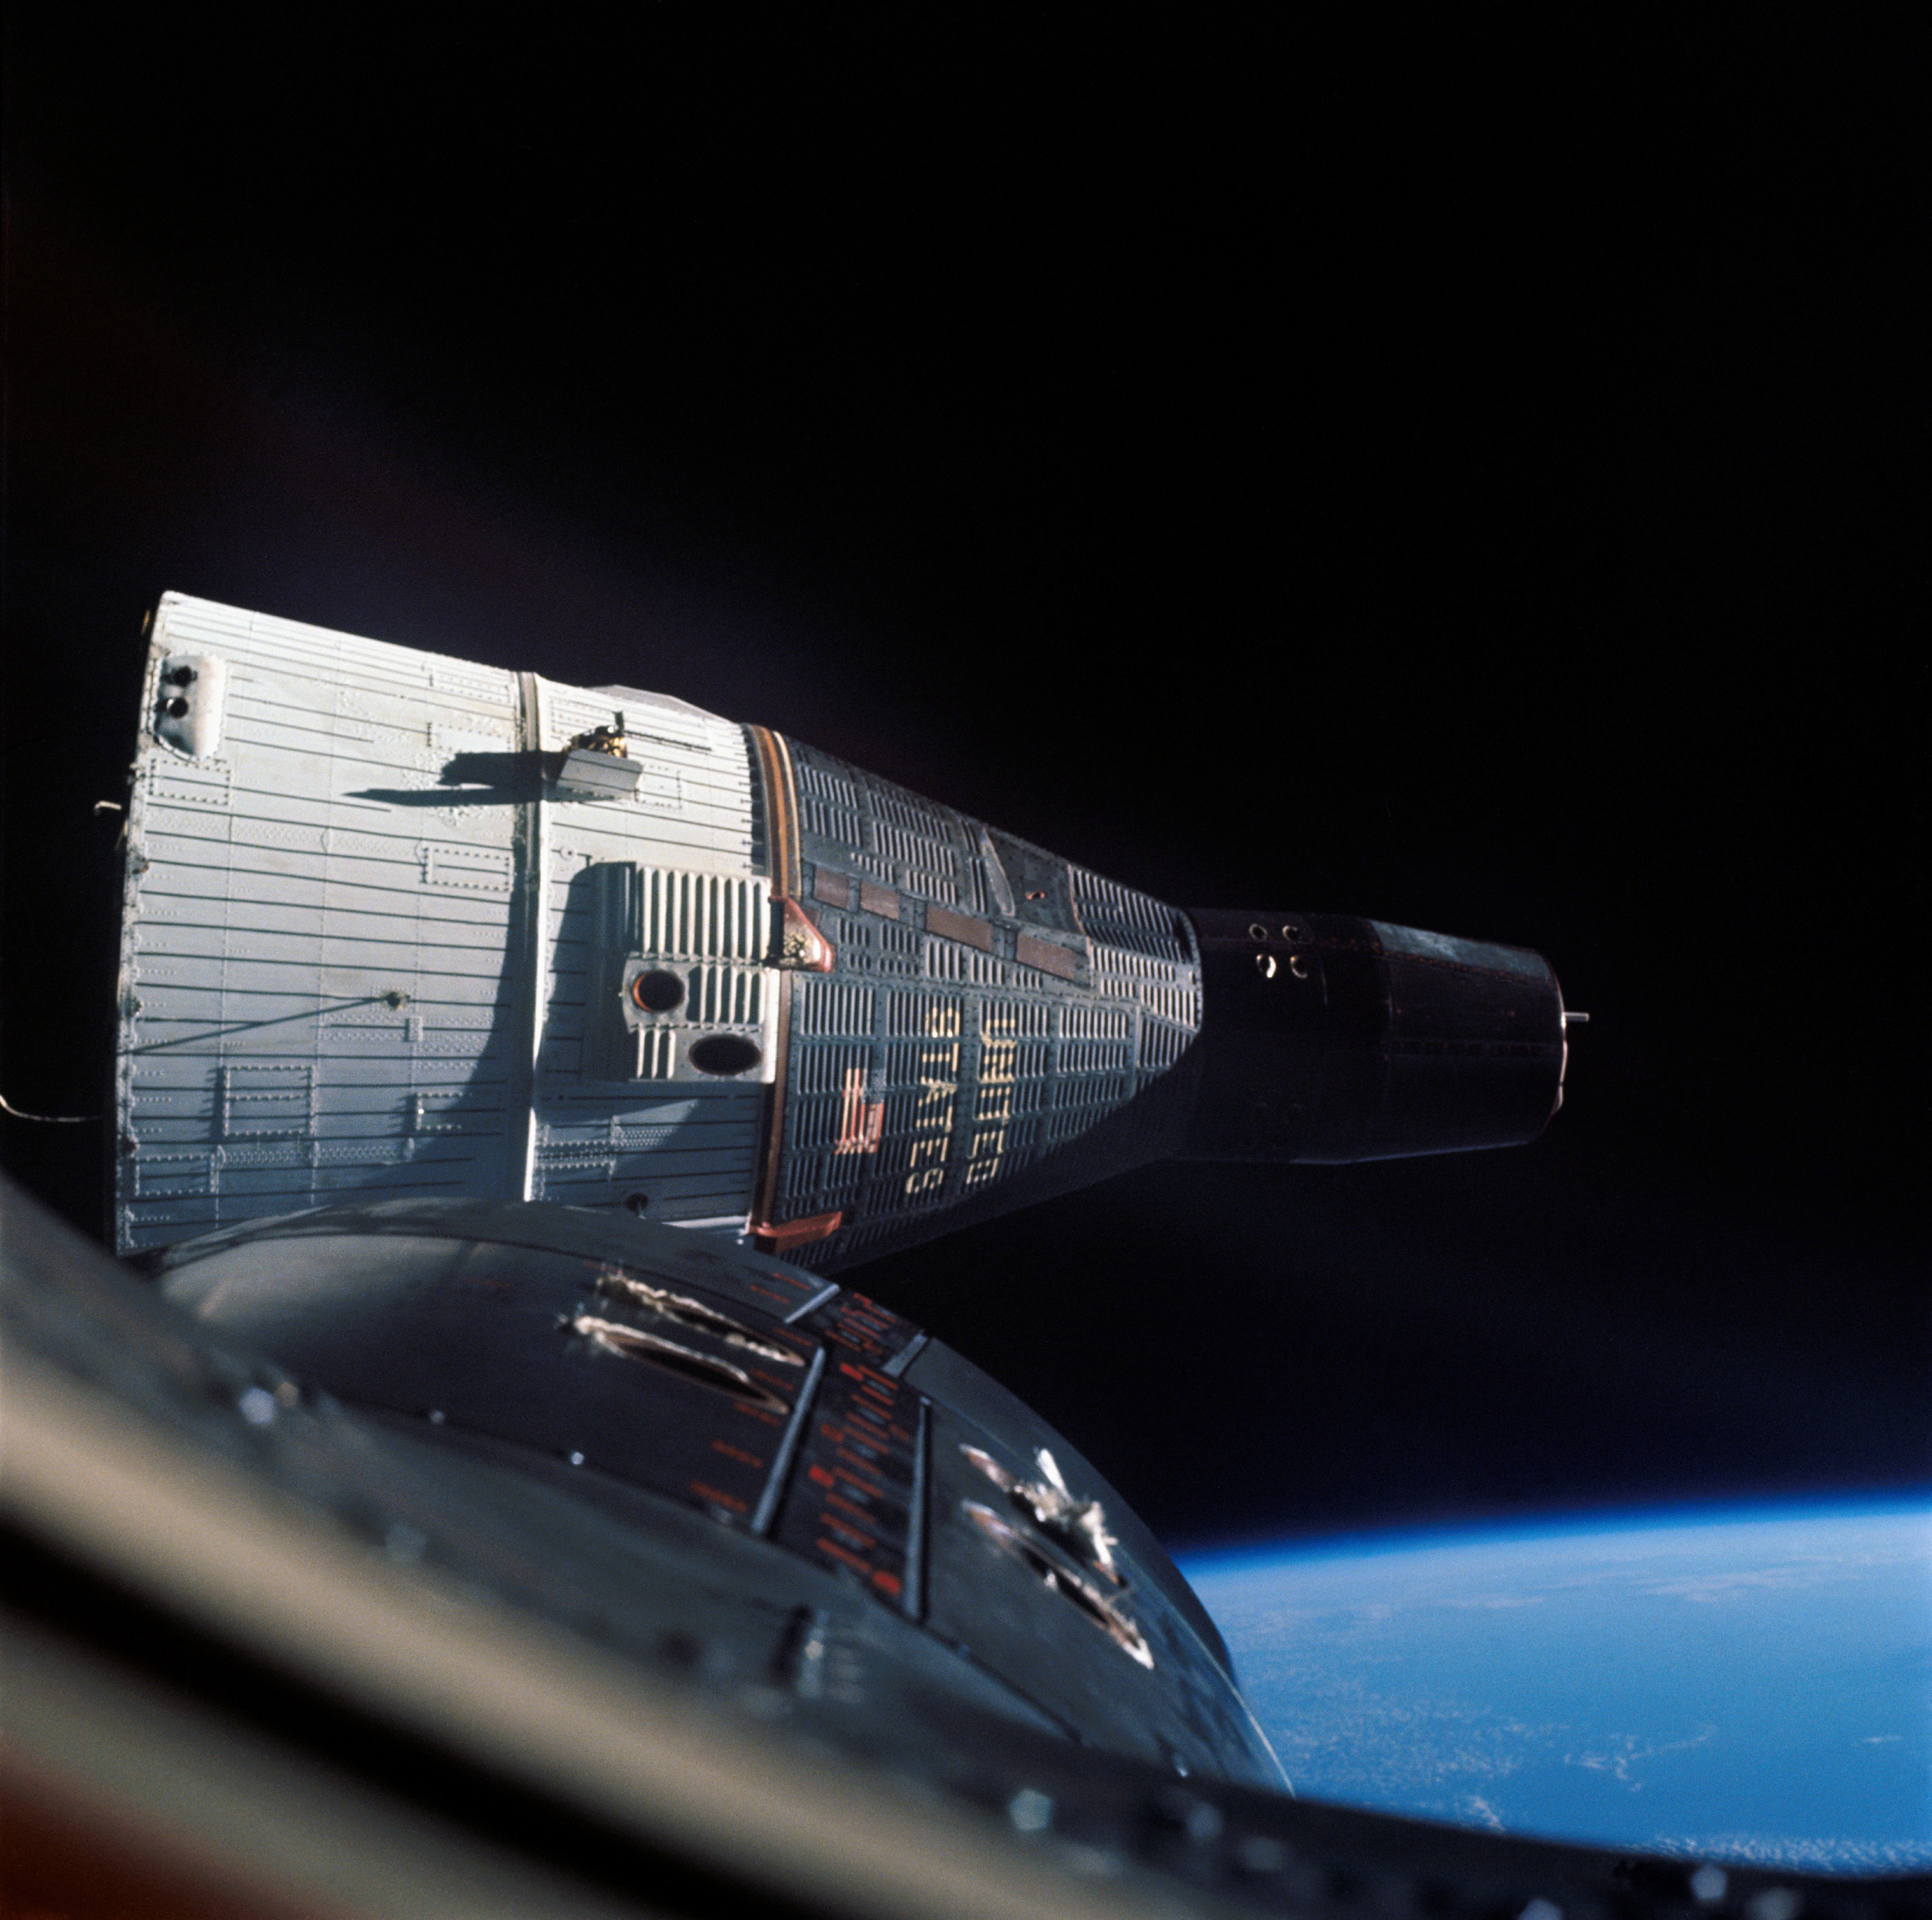 gemini space program history - photo #26